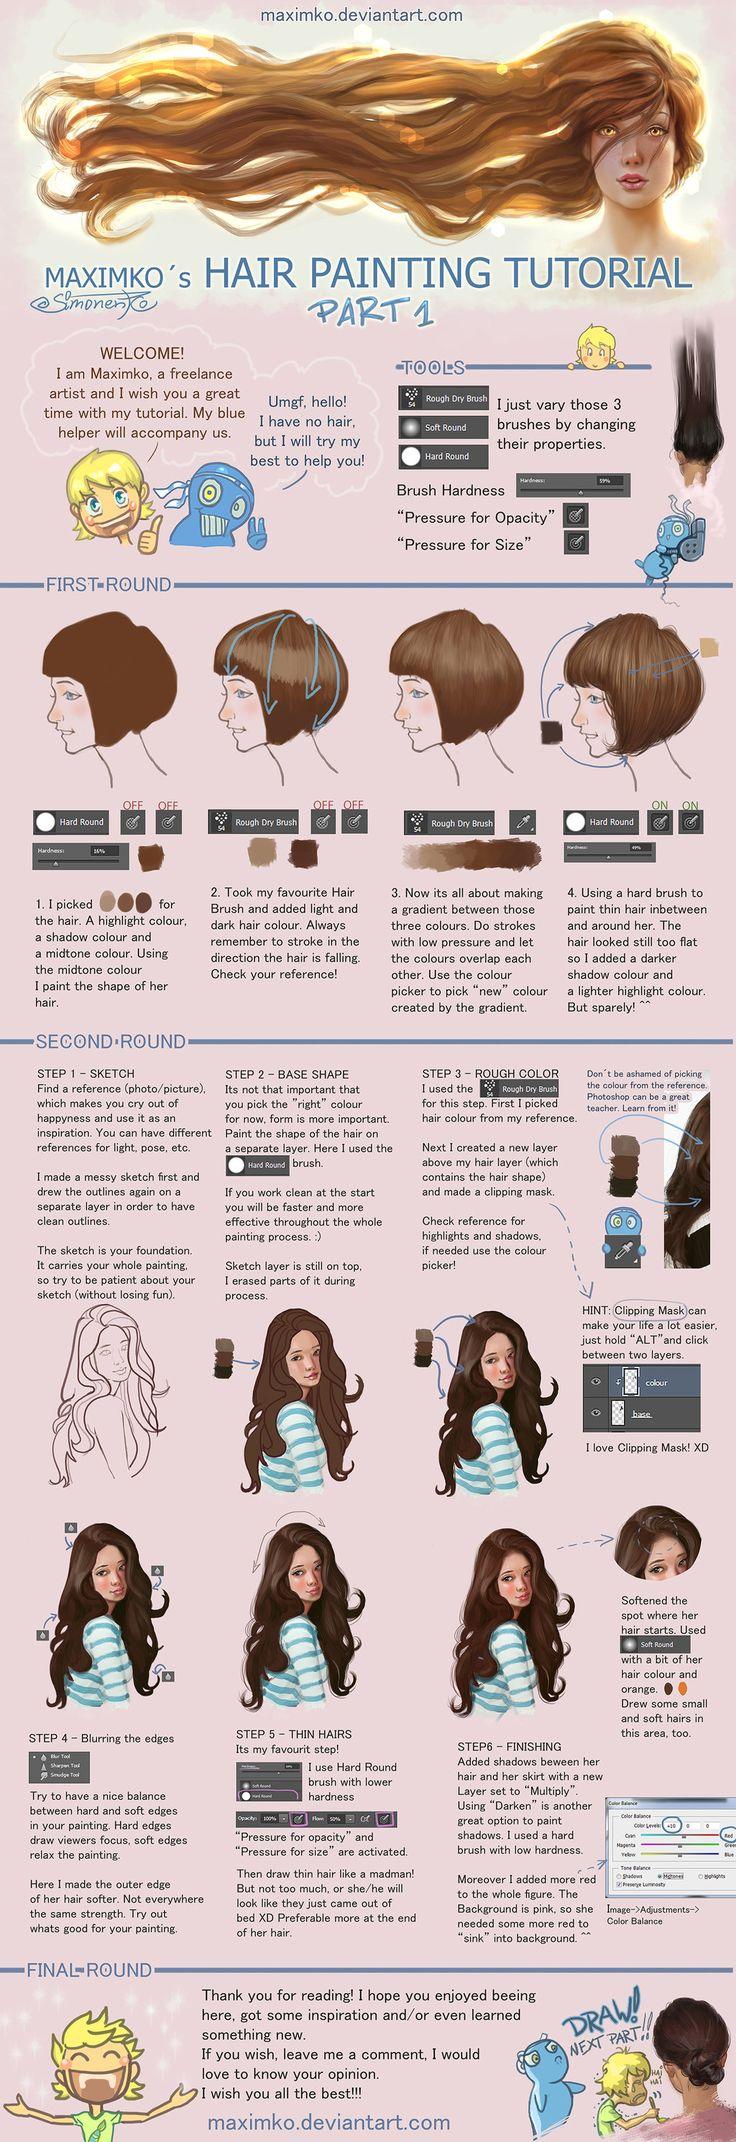 Hair Tutorial - Part 1 by Maximko.deviantart.com on @DeviantArt